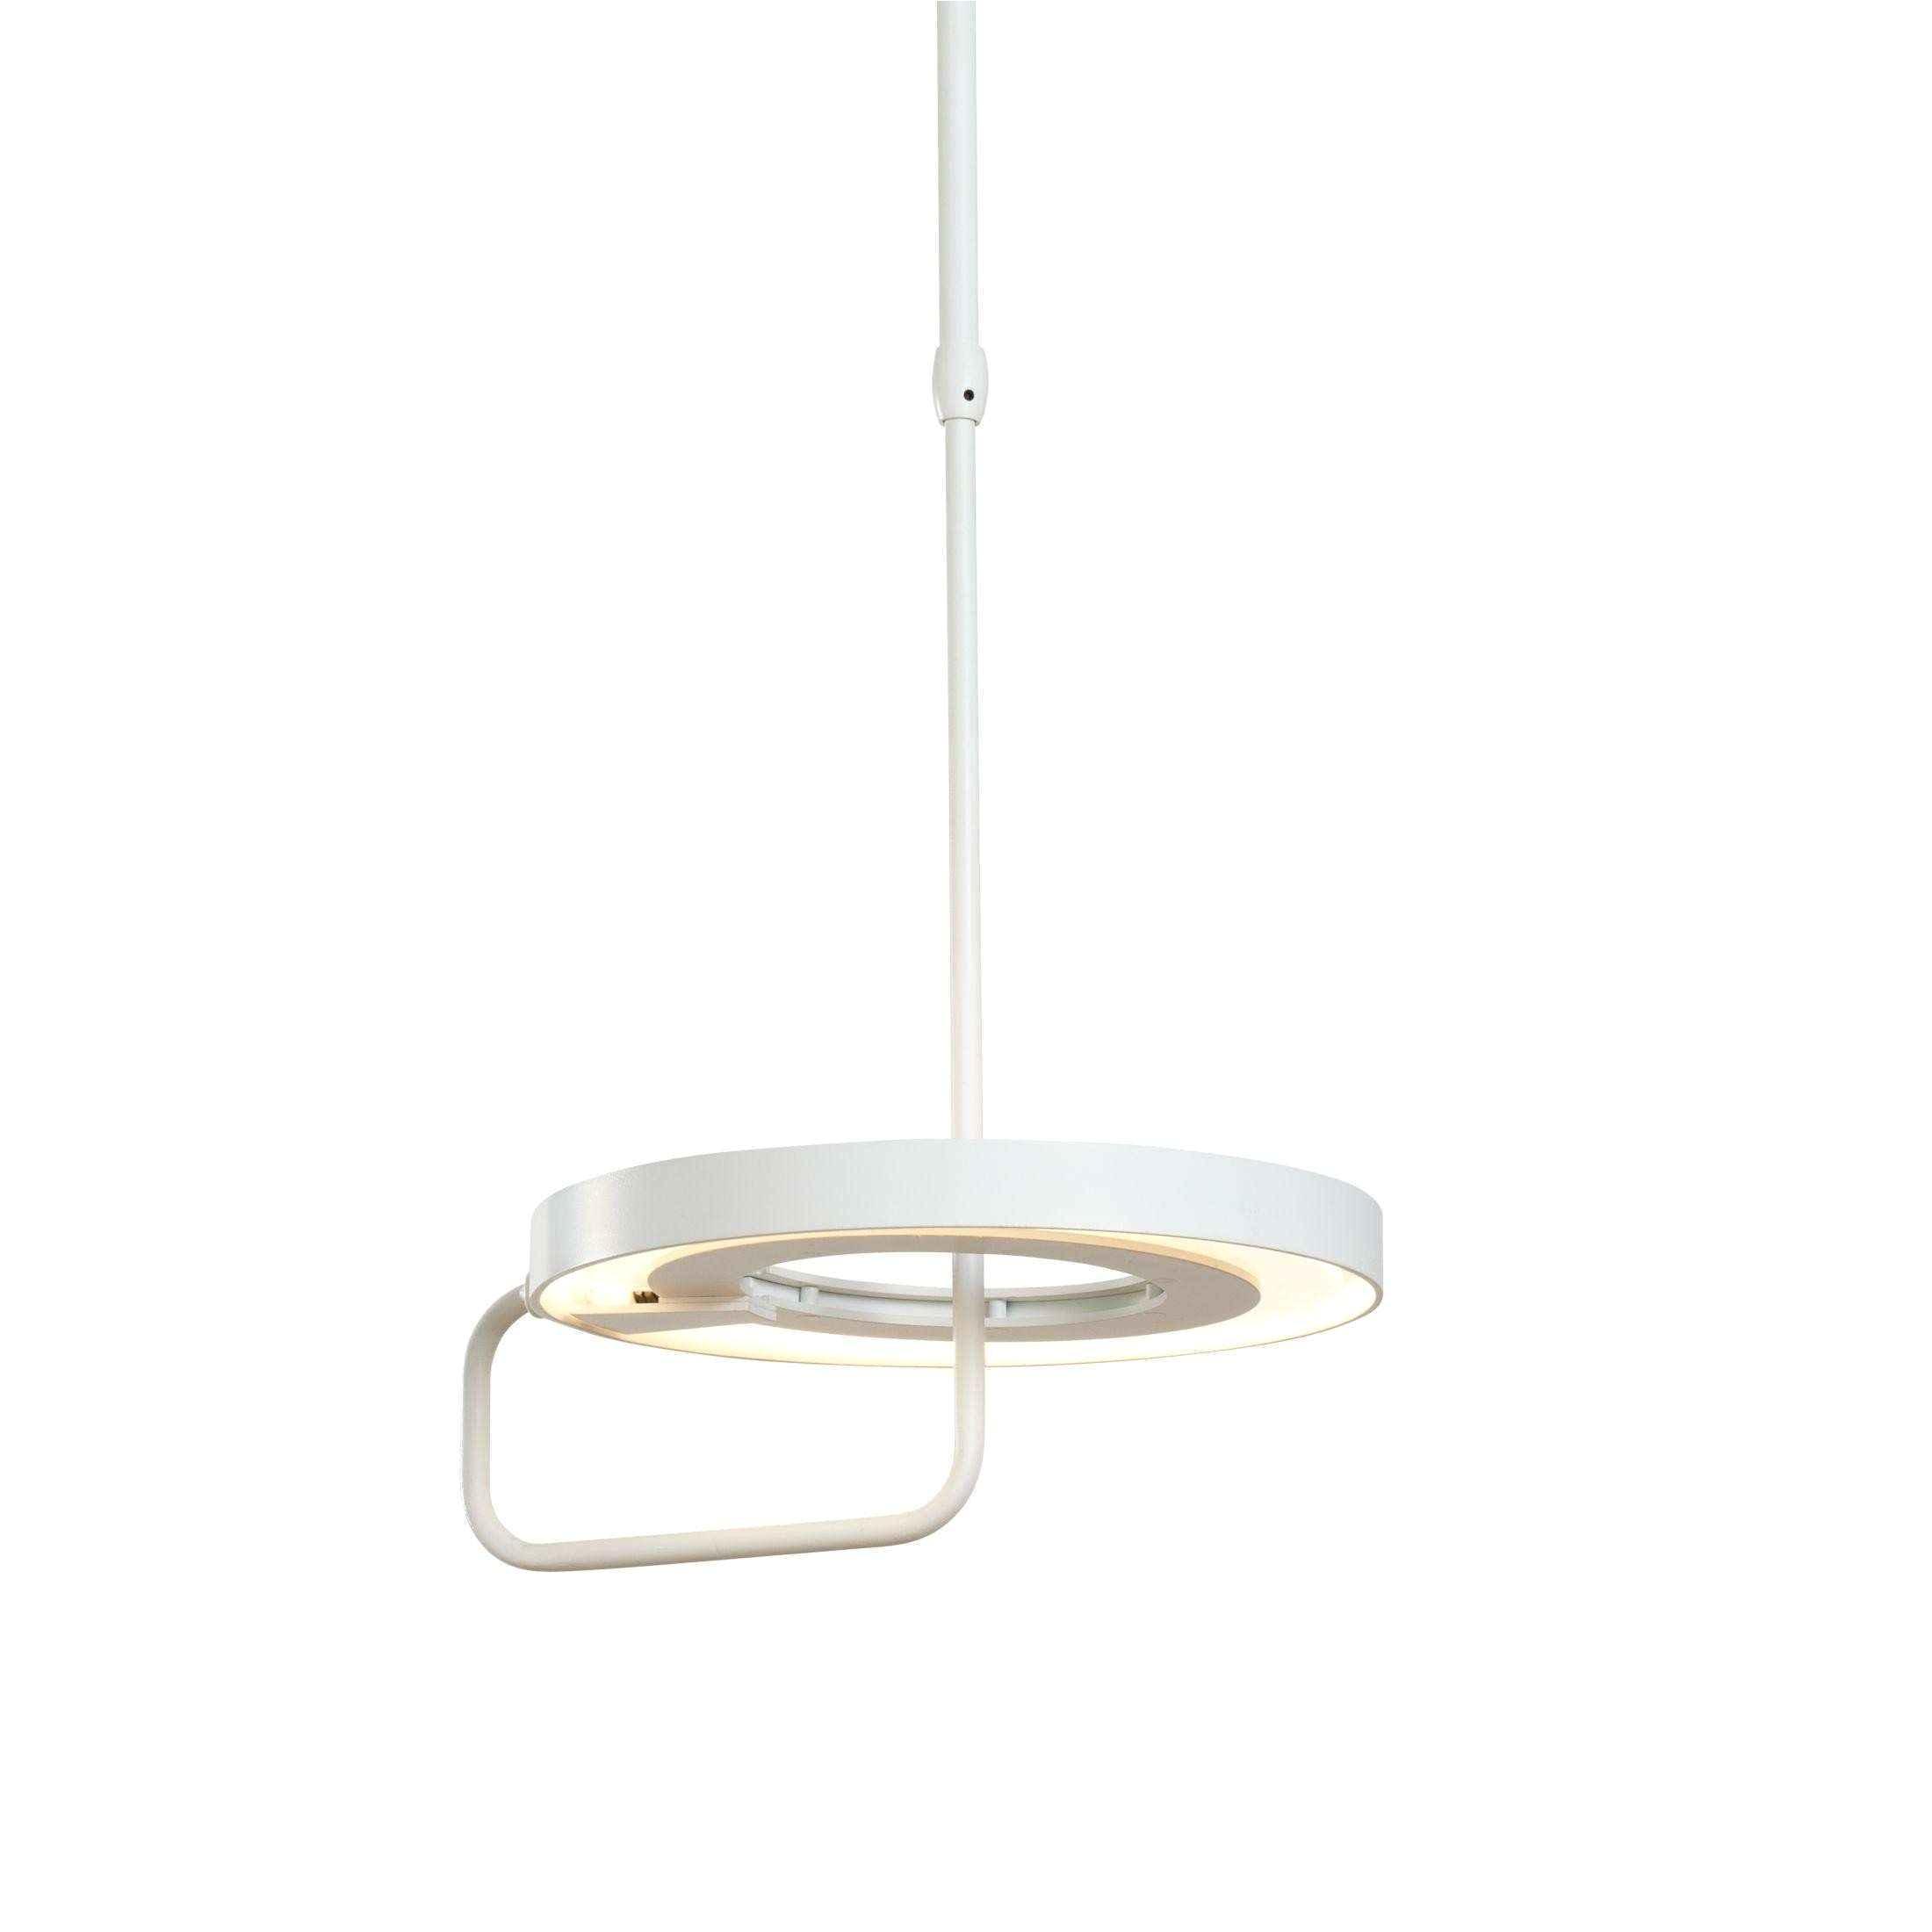 fantastic bedroom ceiling light within led pendant light fixtures unique 16 gem ring chandelier chb0039 0d